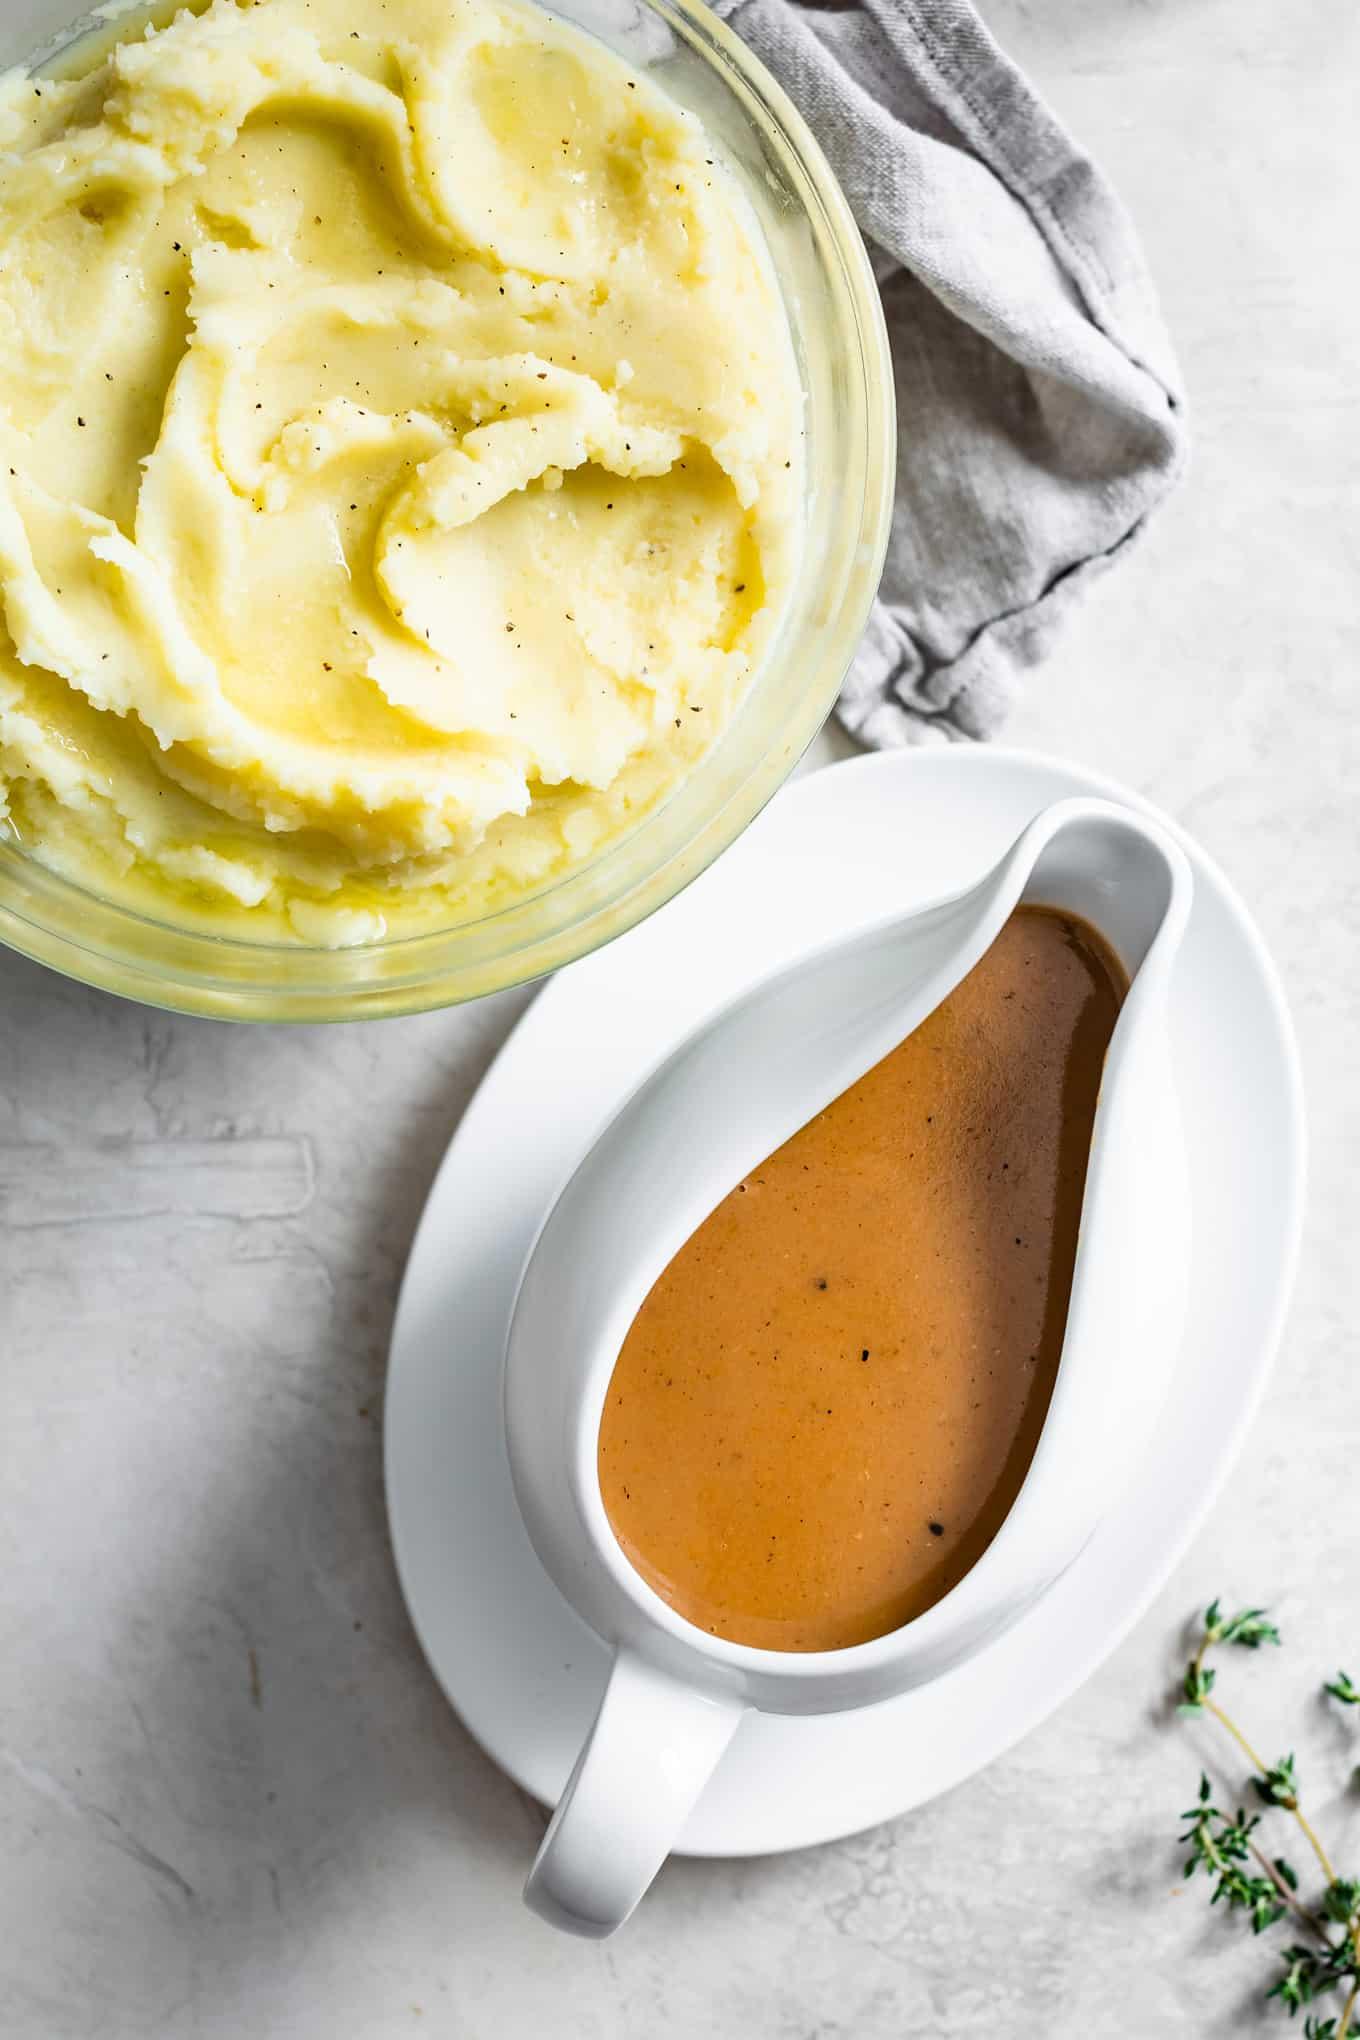 Make-Ahead Gluten-Free Turkey Gravy